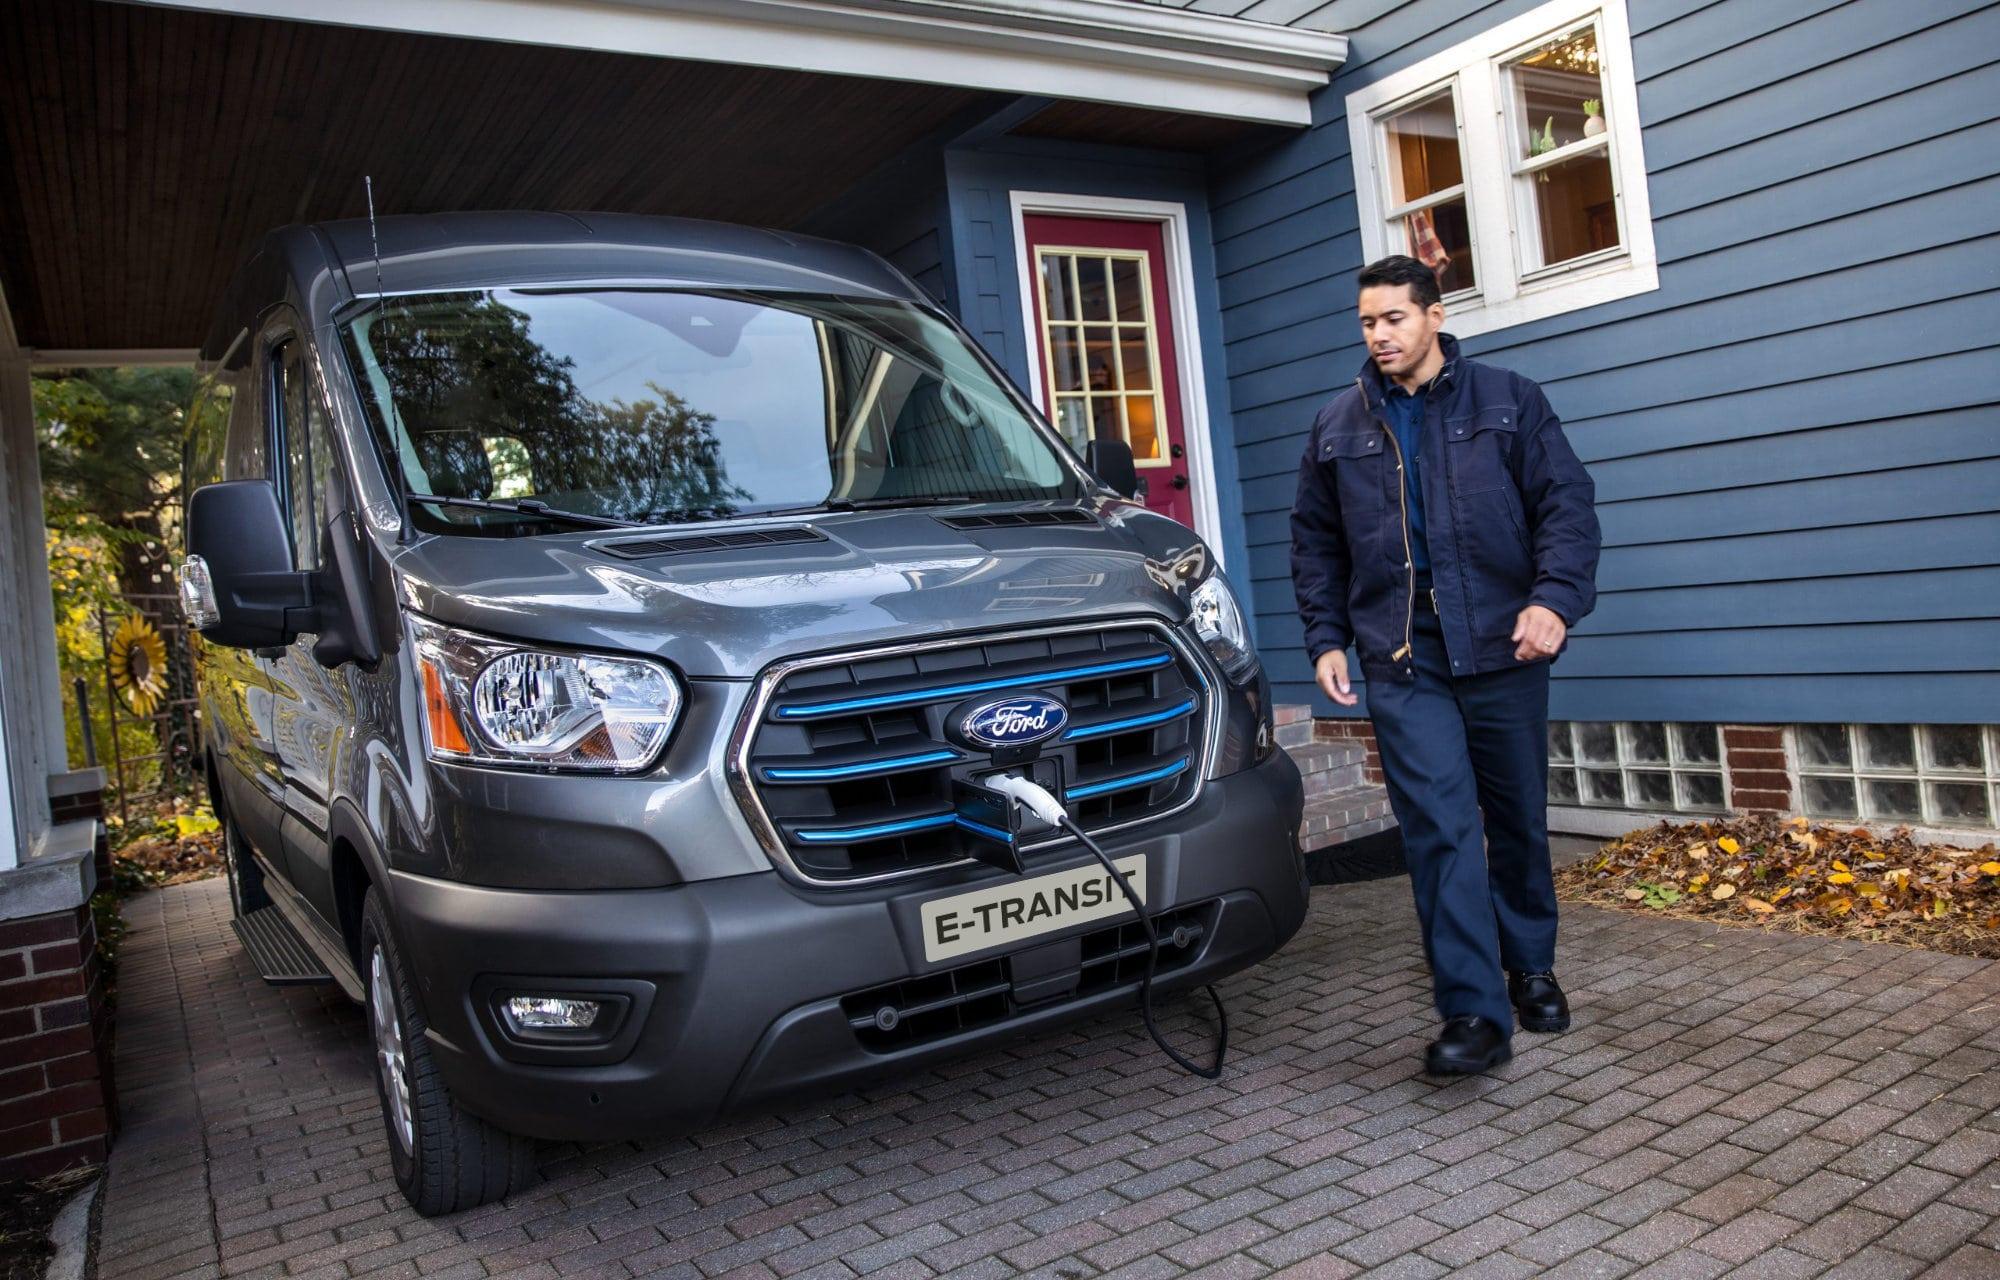 Ford E-Transit lader ved hus